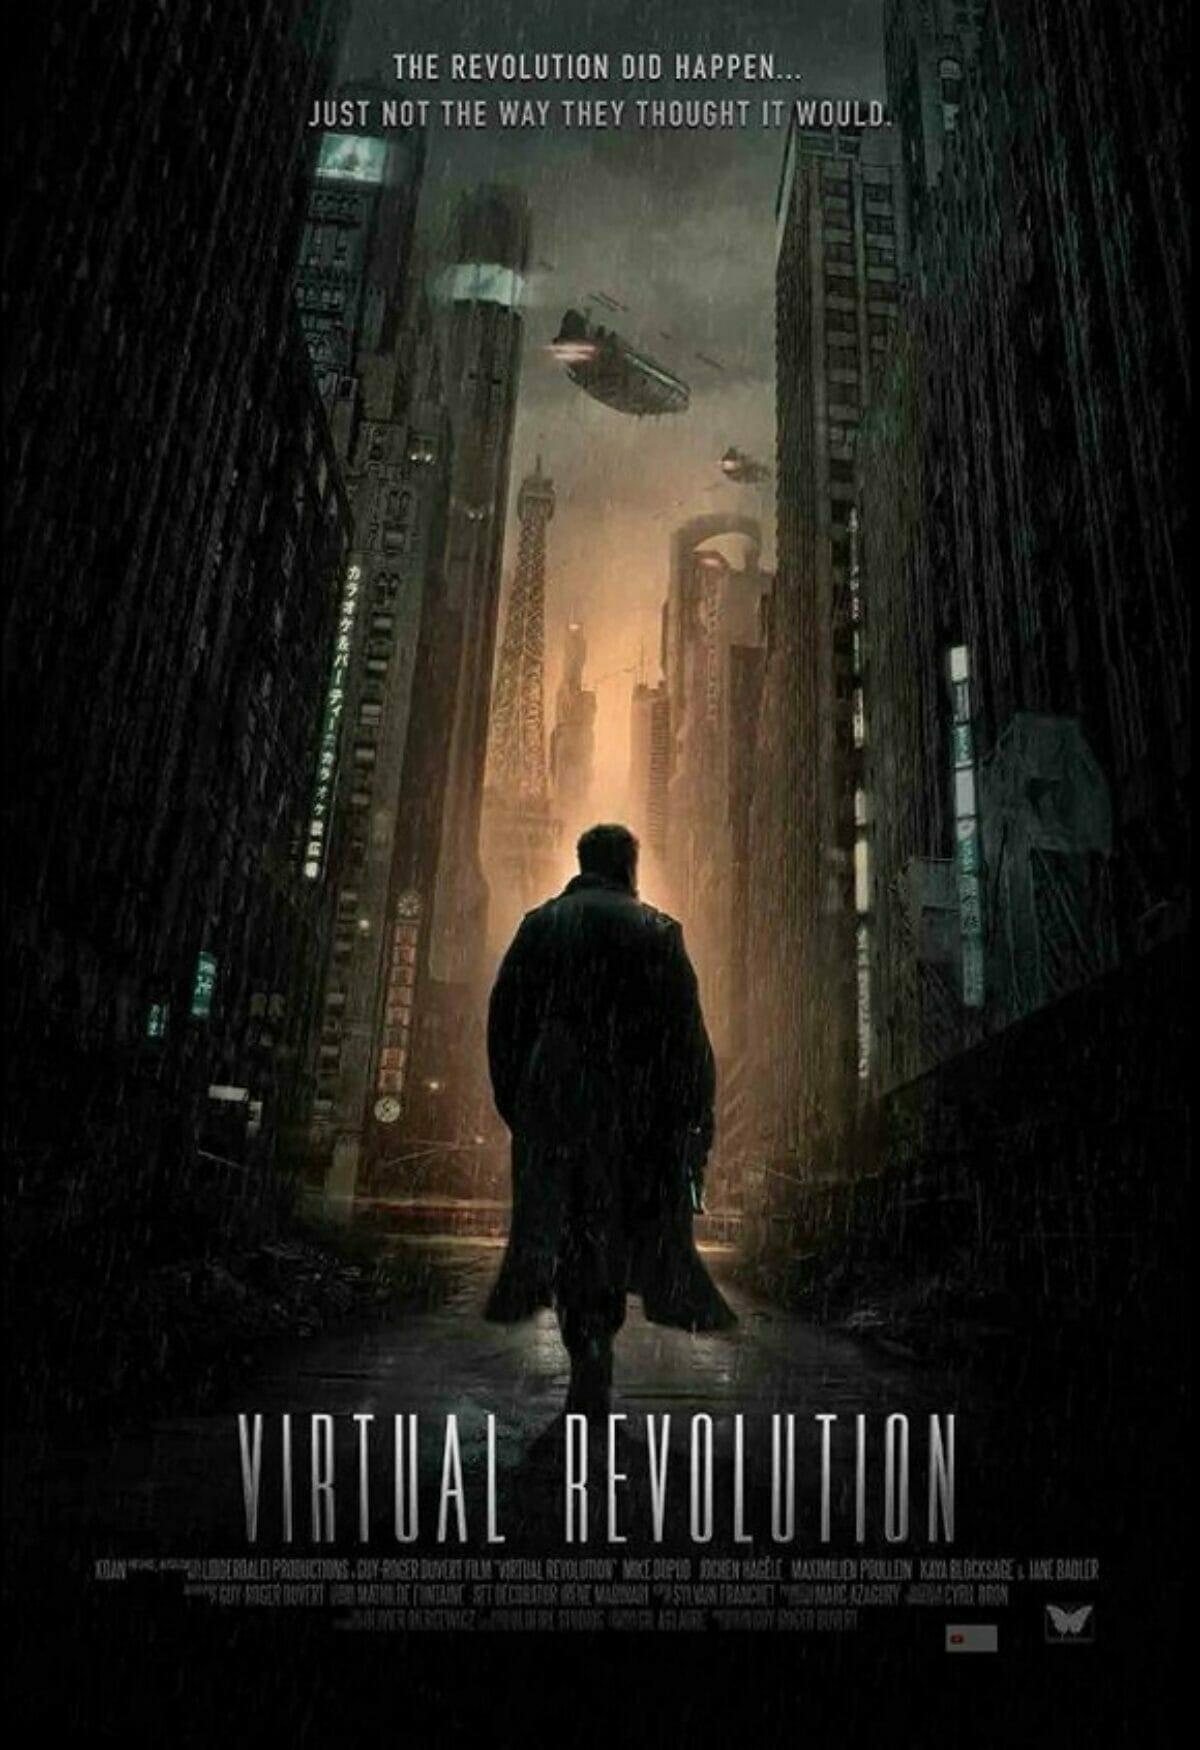 Virtual-Revolution-teaser-poster